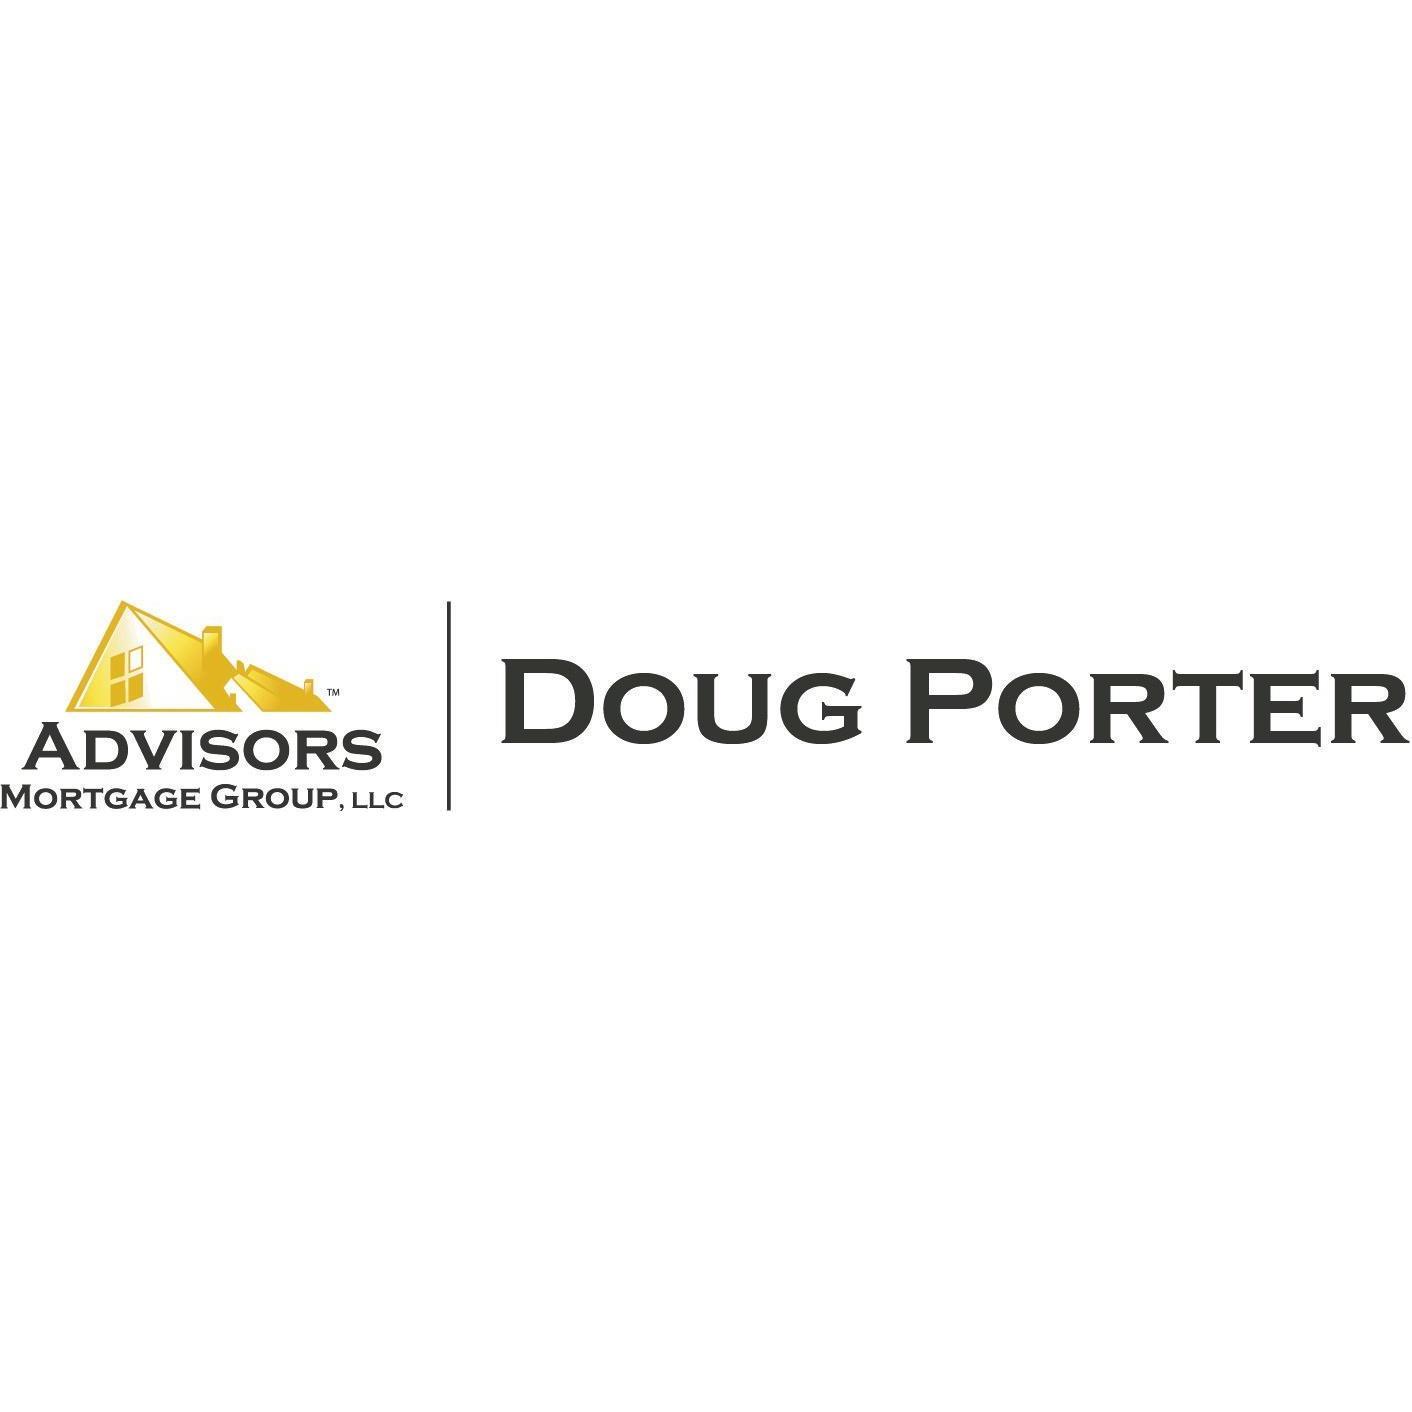 Advisors Mortgage Group LLC - Doug Porter